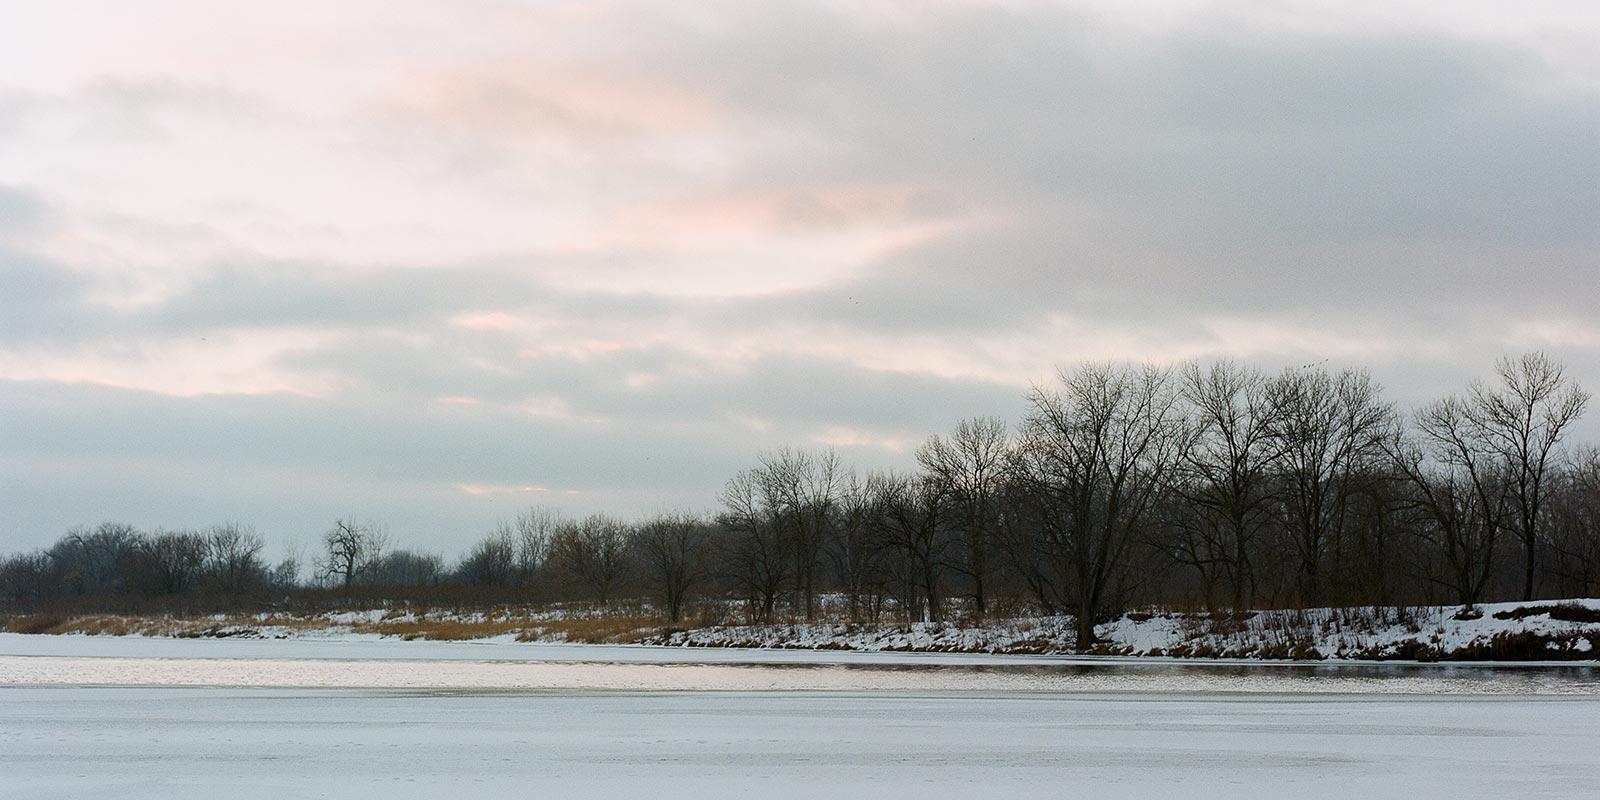 minnesota-winter-landscape-photography-06.jpg